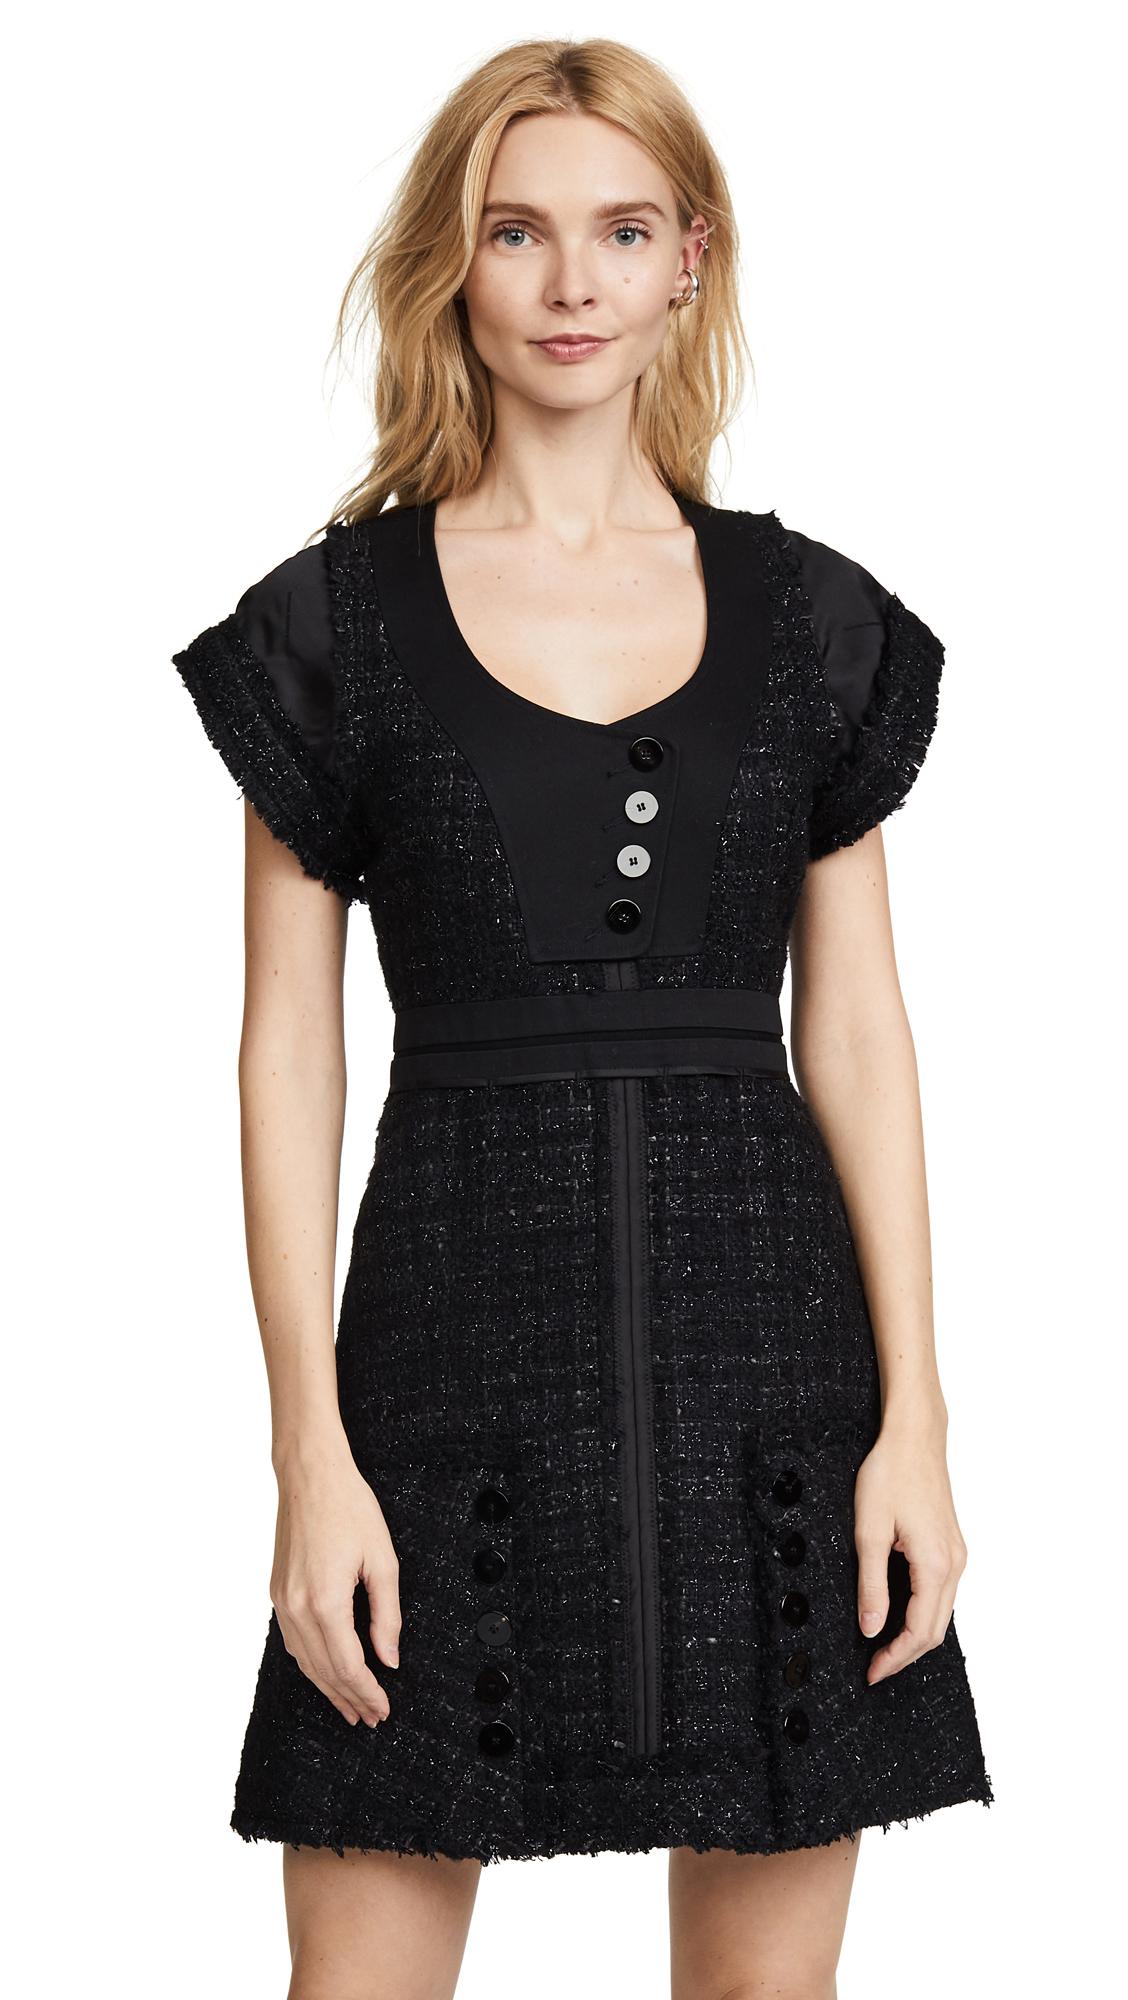 Alexander Wang Deconstructed Tweed Dress